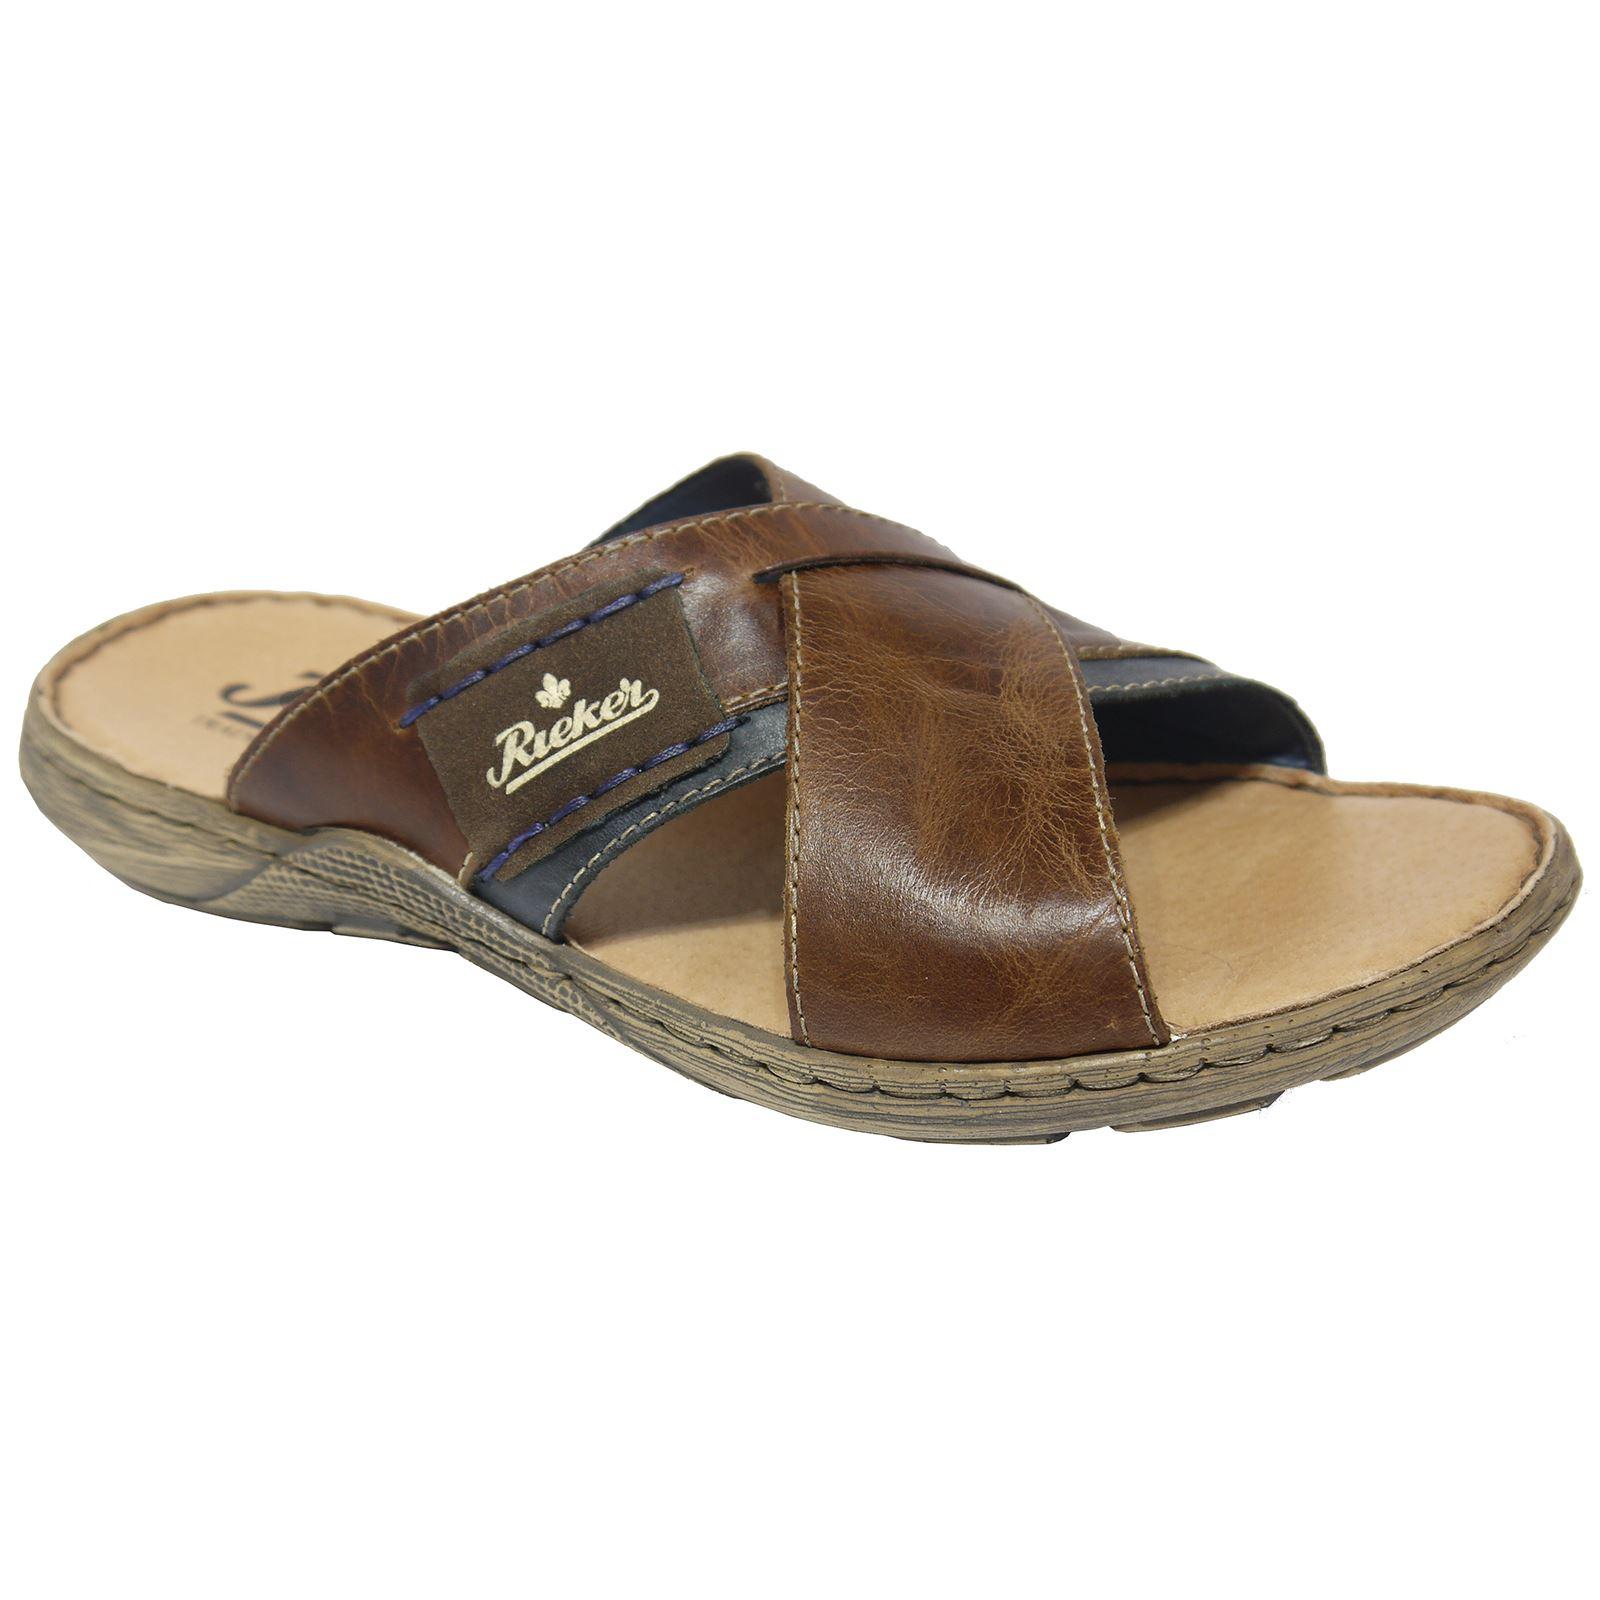 d1208eacbeec94 Rieker 22099-25 Brown Combi Mens Leather Slip-On Mules Slide Sandals ...